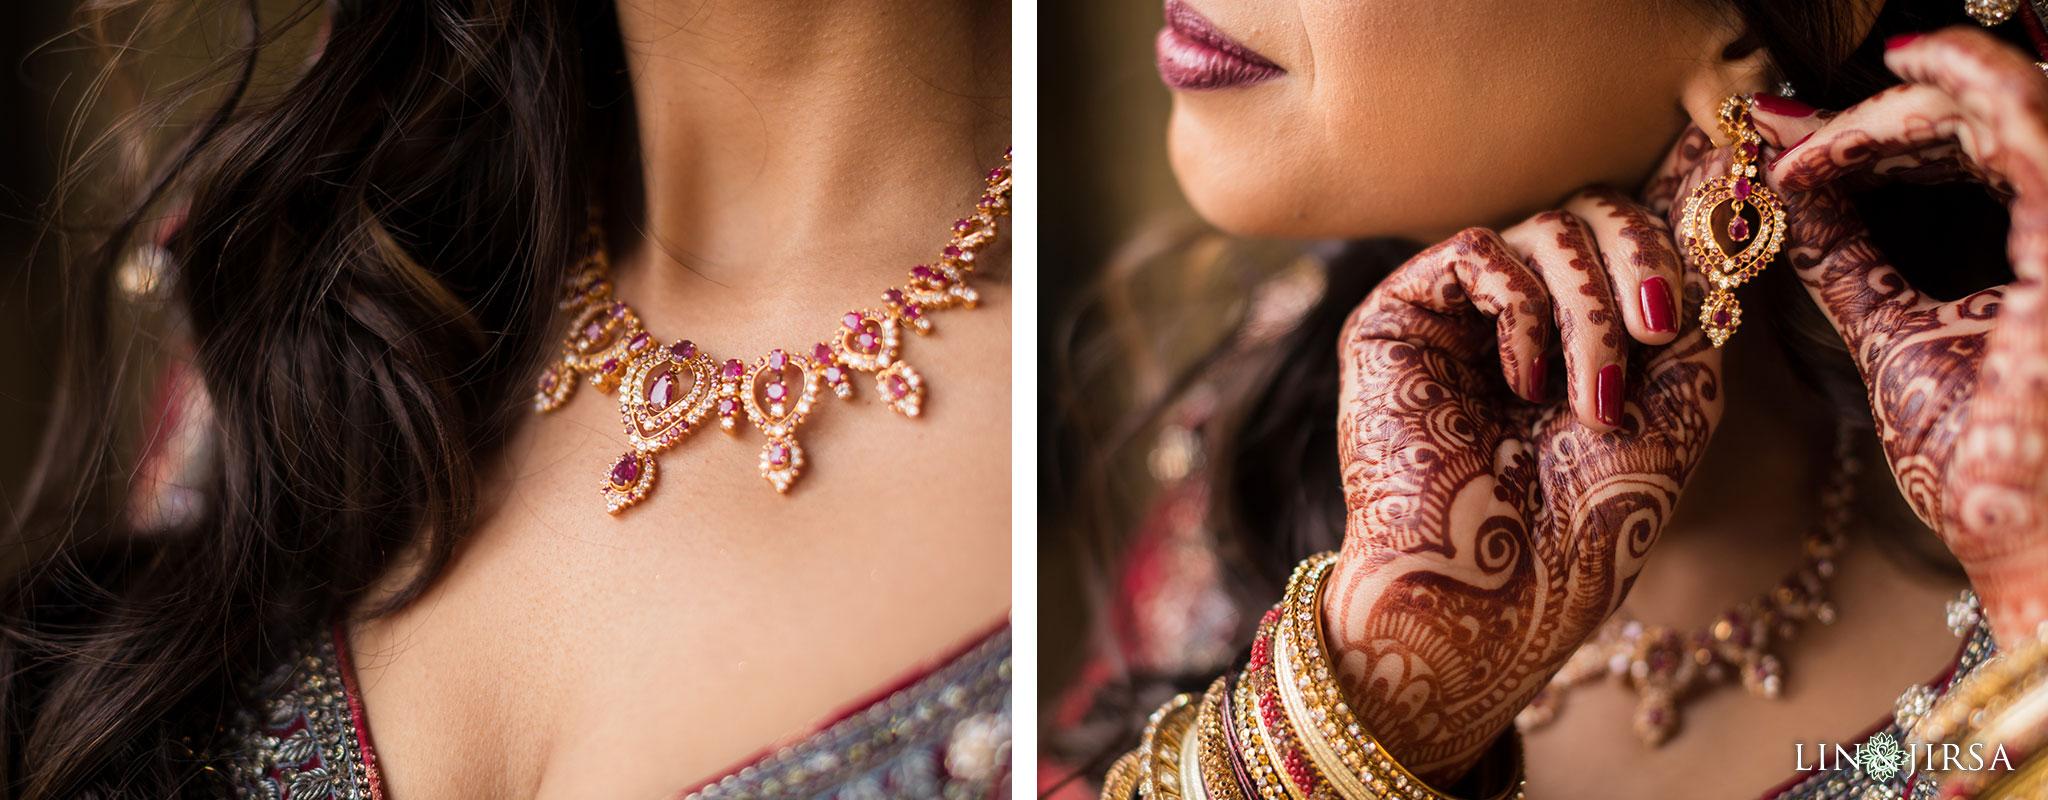 04 altadena town country club pakistani bride wedding photography